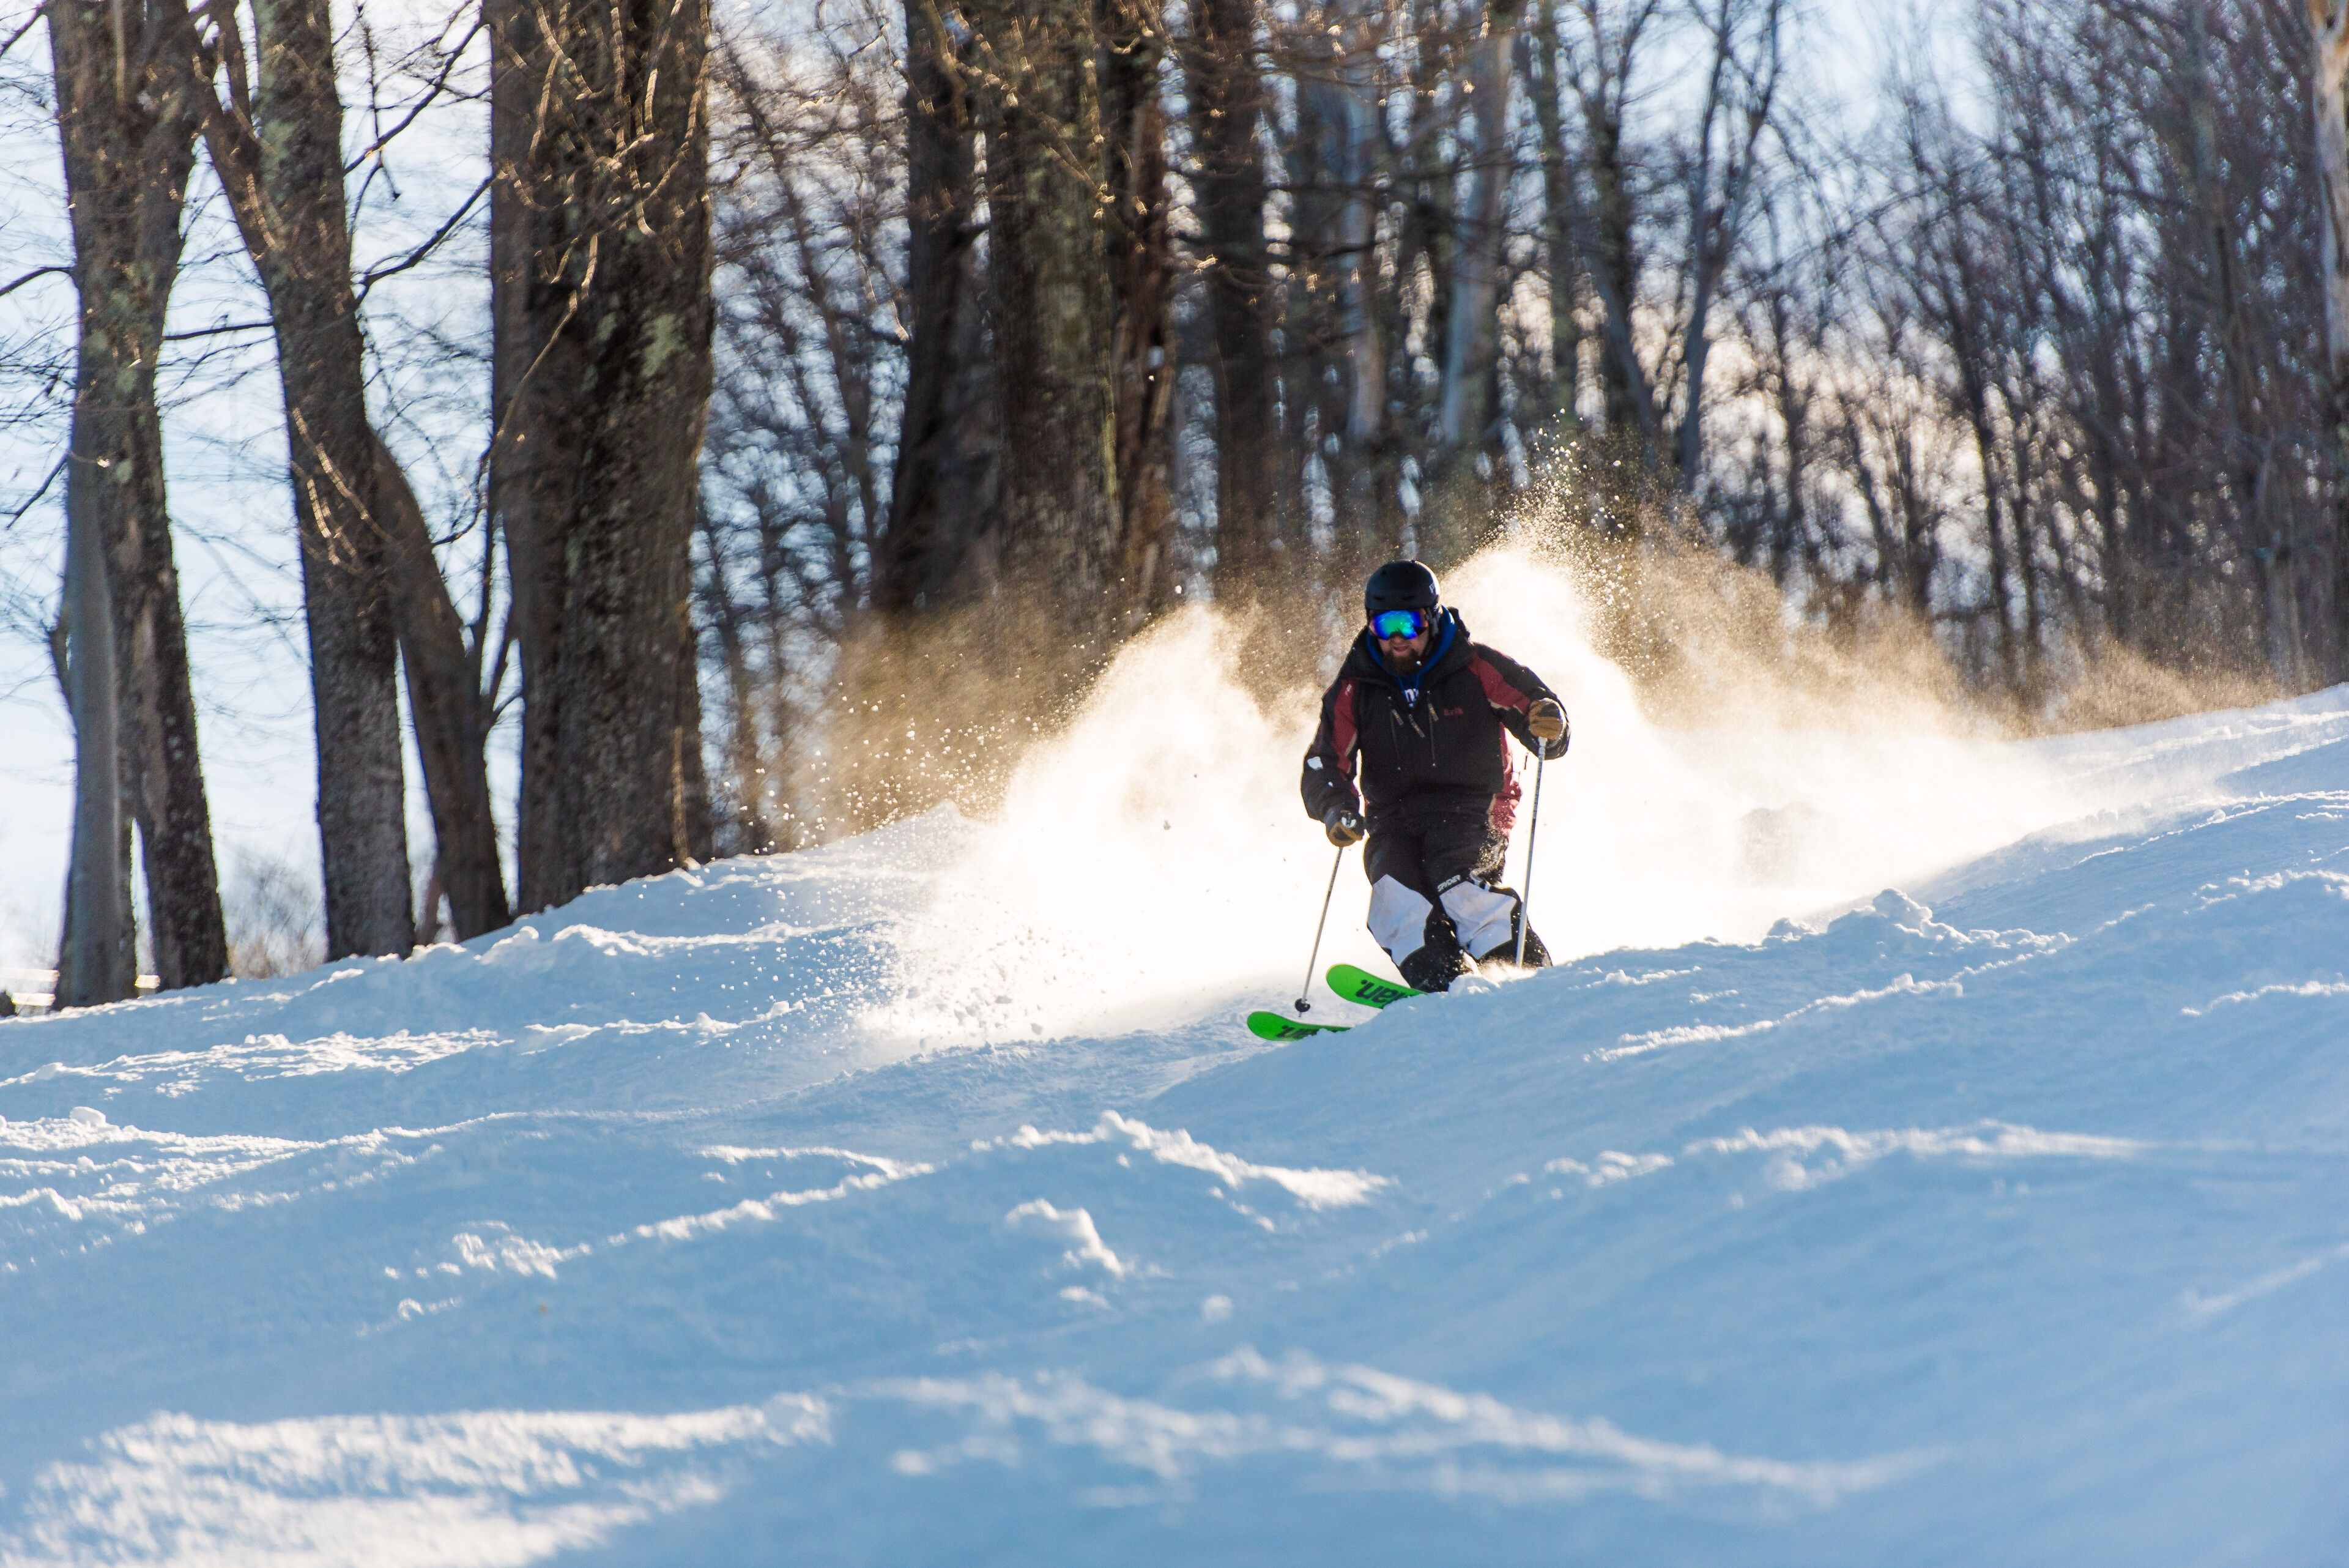 ulster county winter adventure